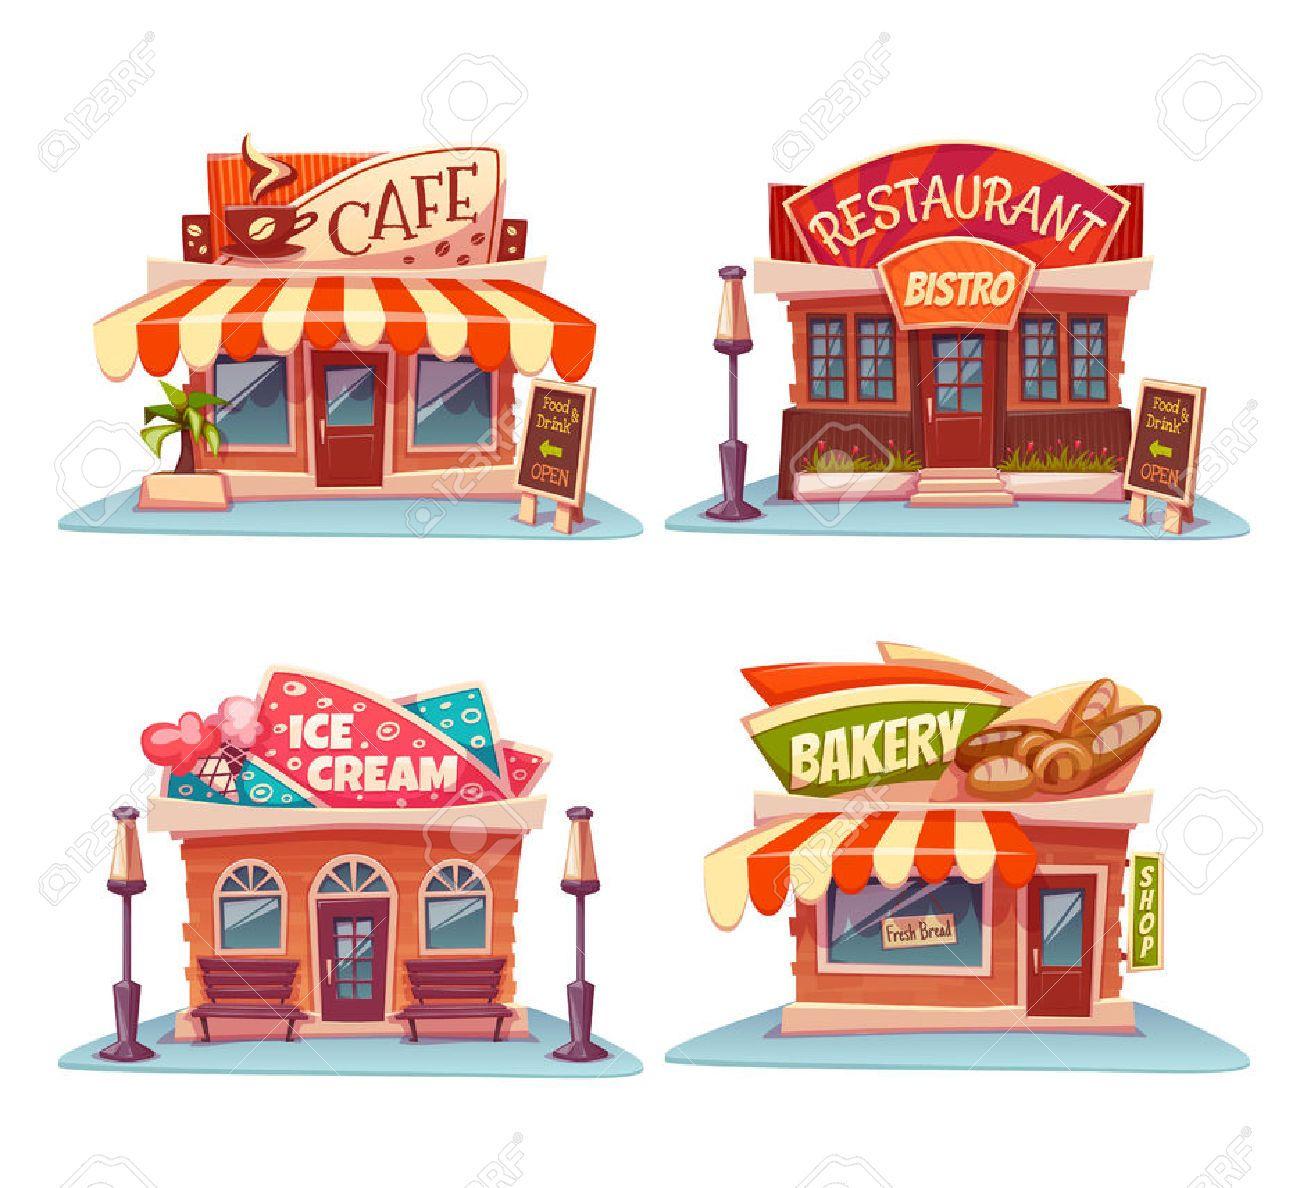 Clipart restaurant cute restaurant.  illustrations and